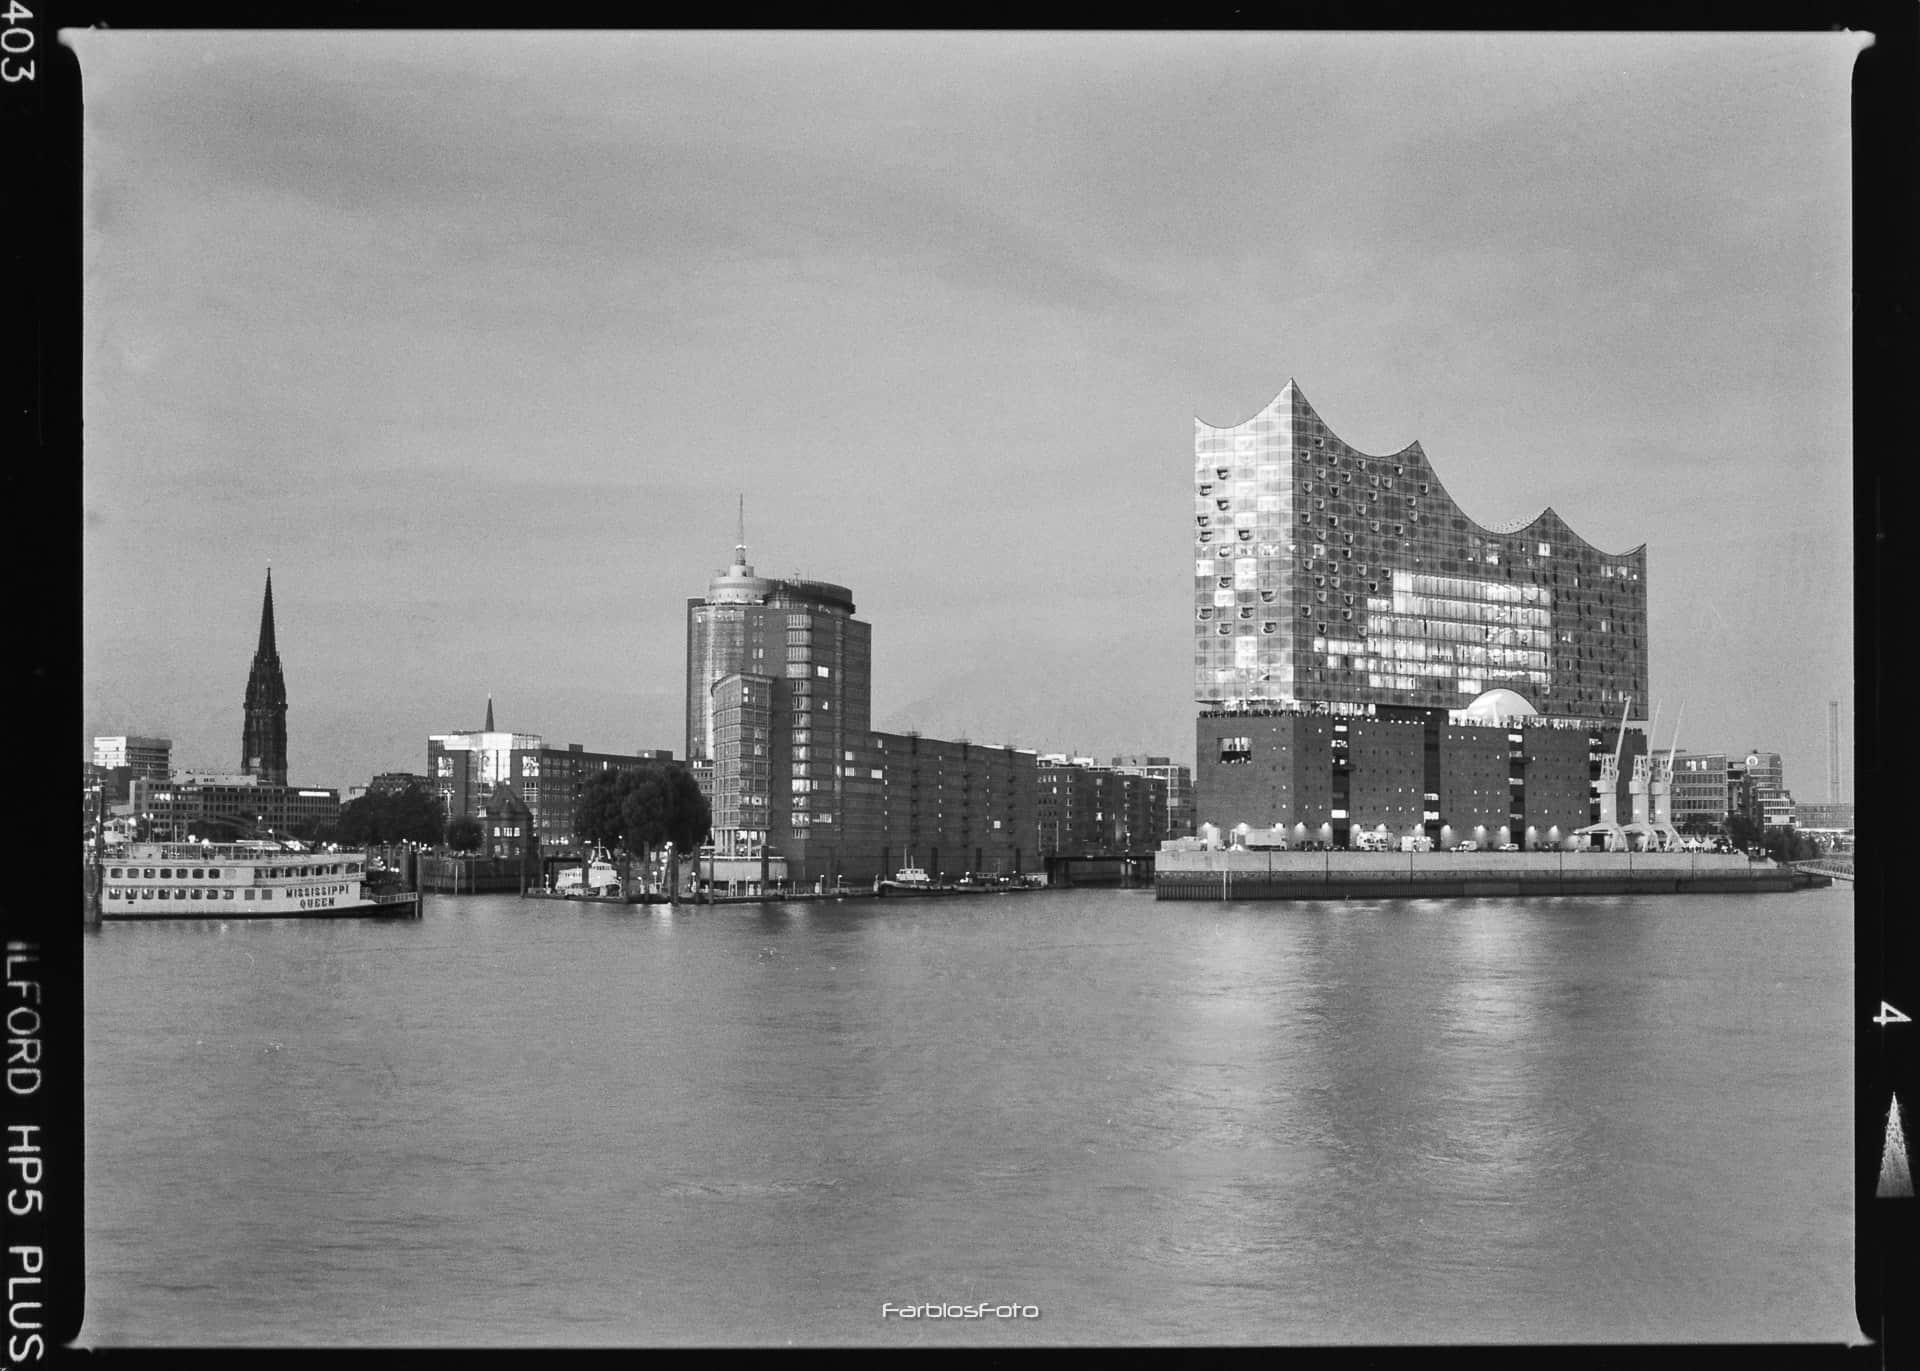 Aufnahme der Elbphilharmonie | Mamiya M645 1000s | Ilford HP5